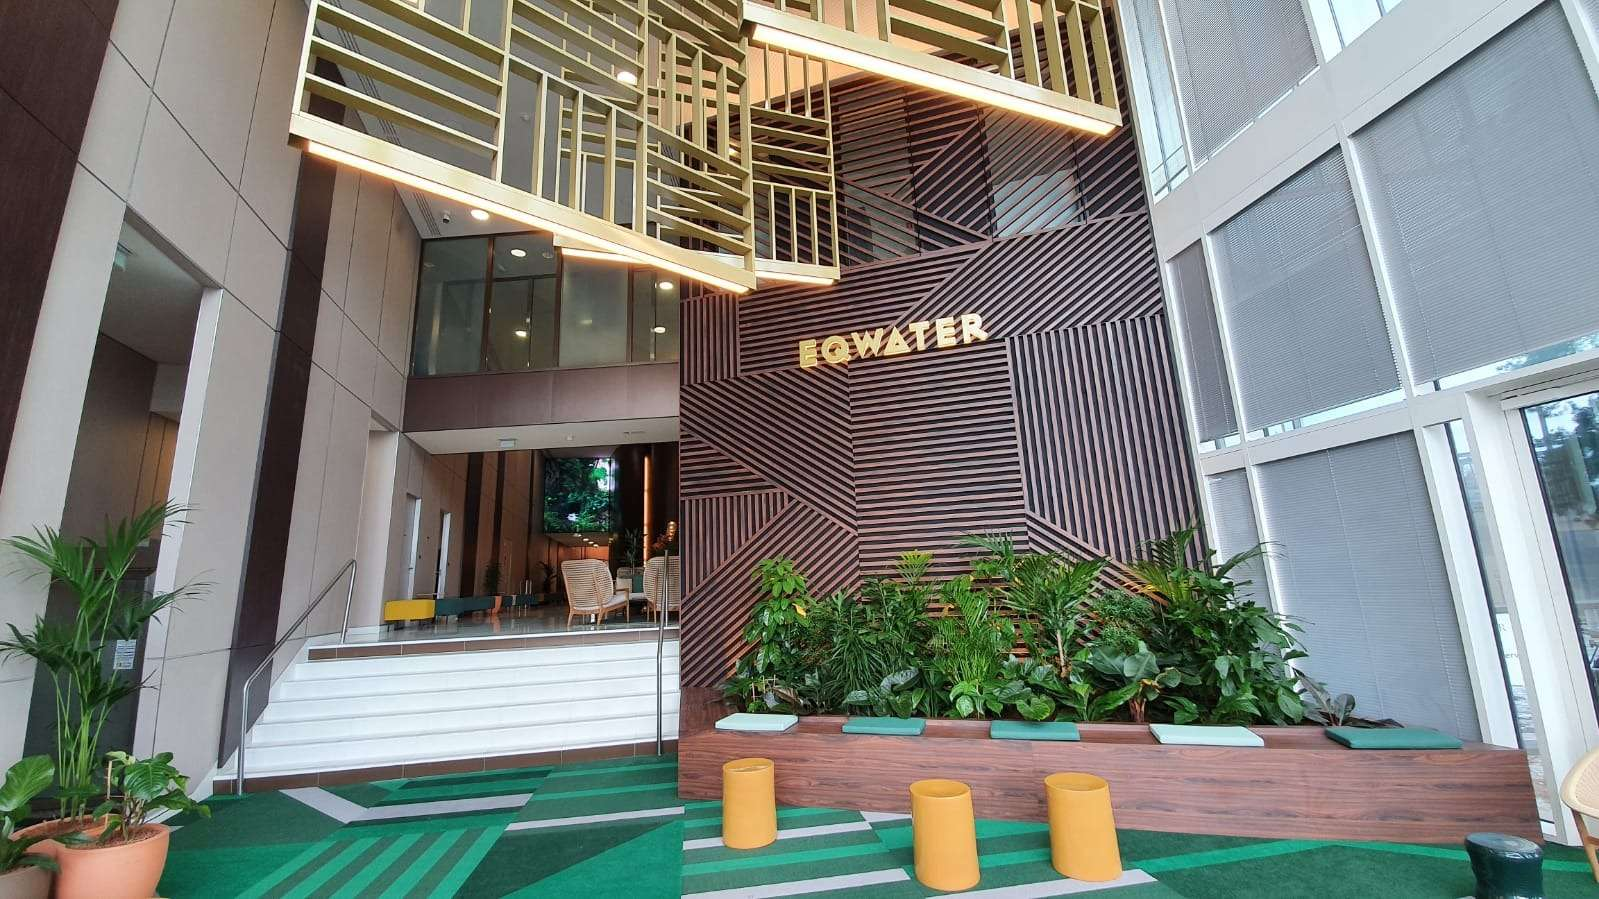 Eqwater